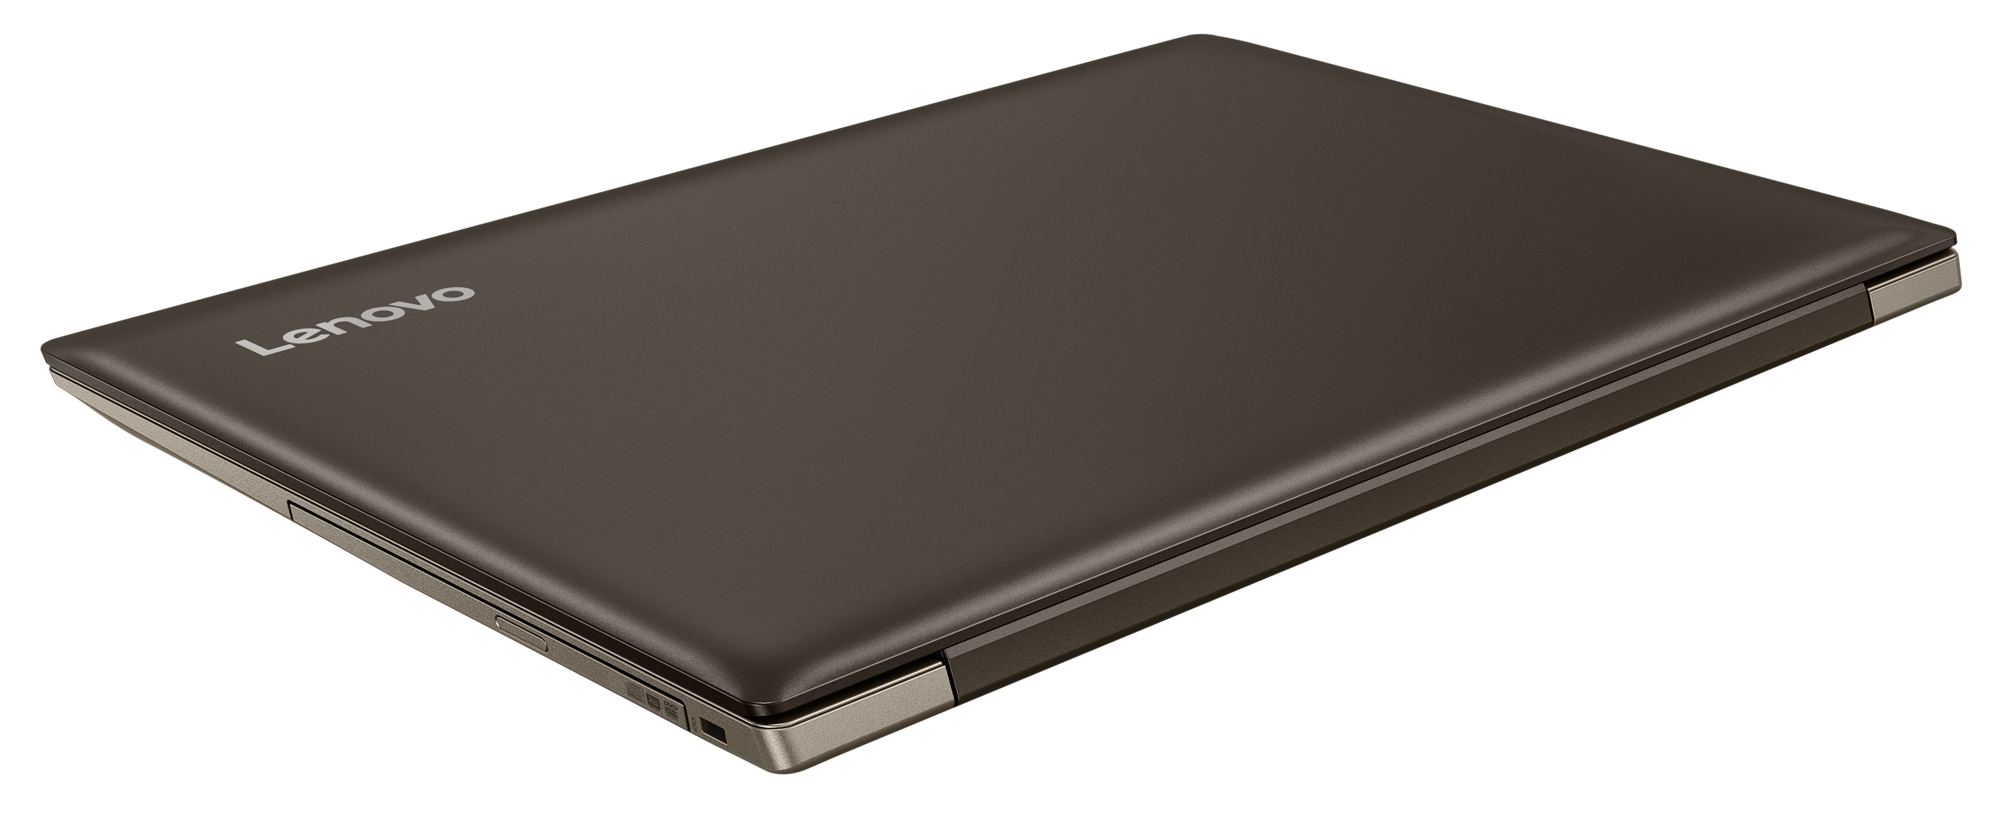 Фото  Ноутбук Lenovo ideapad 330-15 Chocolate (81DE01W6RA)